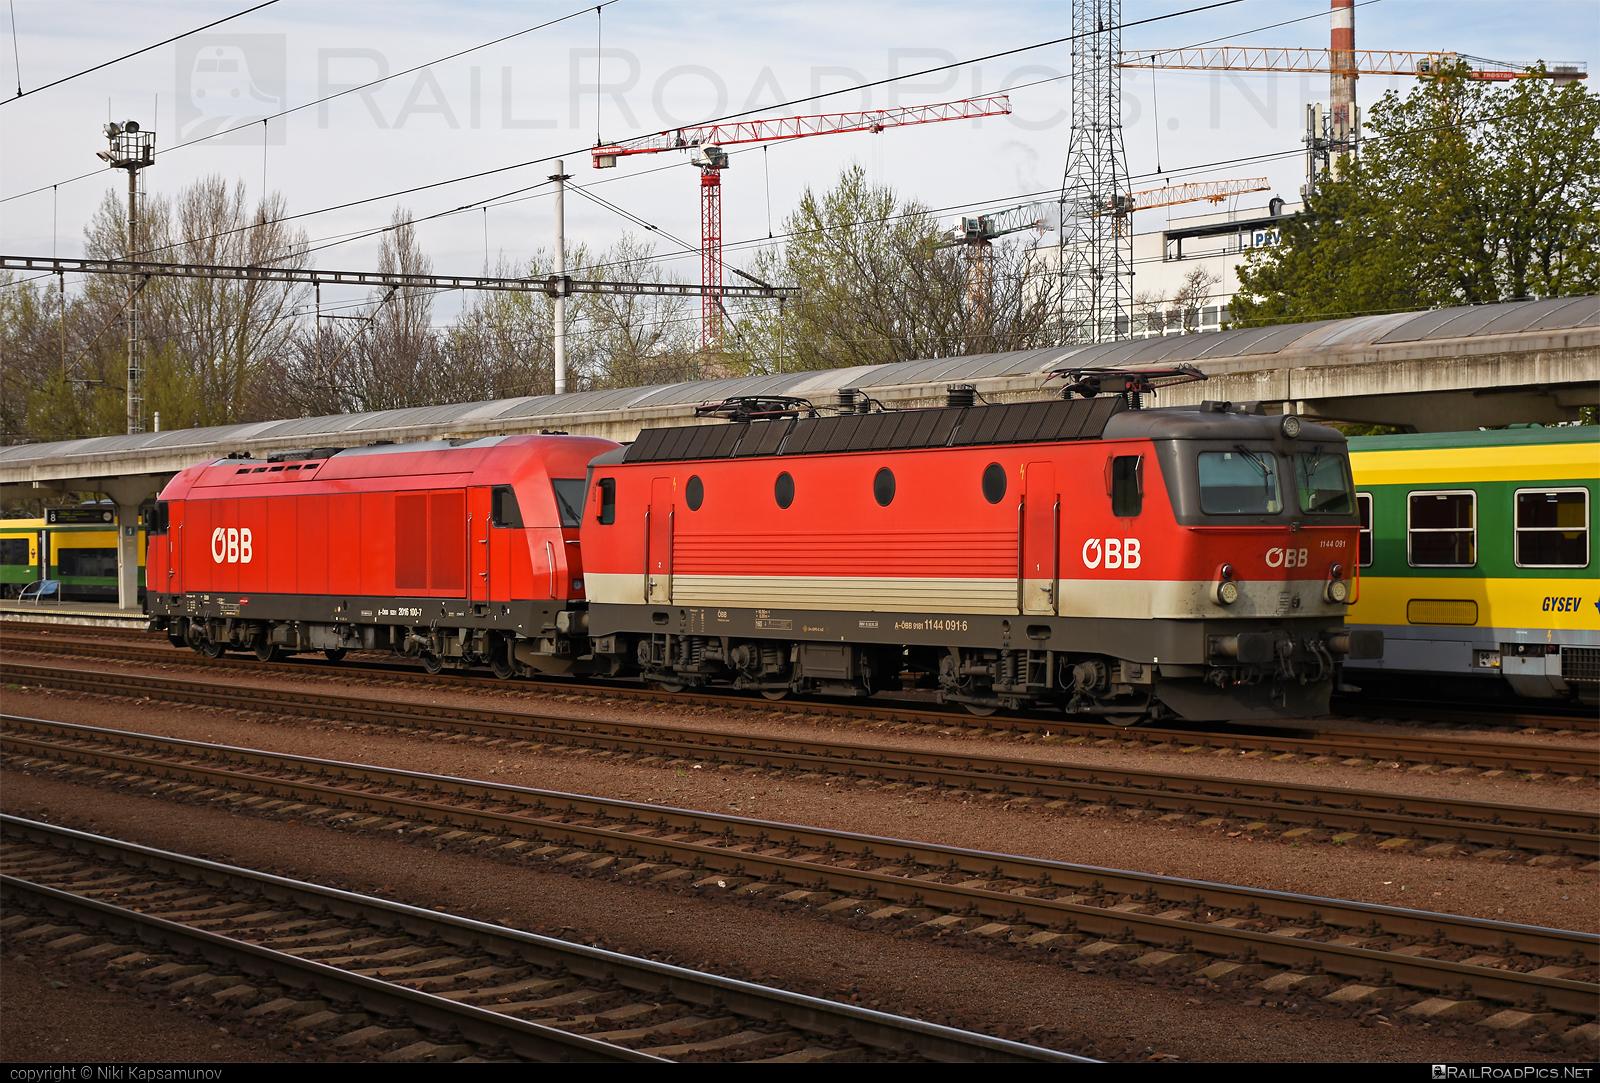 SGP ÖBB Class 1144 - 1144 091 operated by Rail Cargo Austria AG #1144 #hercules #obb #obbclass1144 #osterreichischebundesbahnen #rcw #sgp #sgp1144 #simmeringgrazpauker